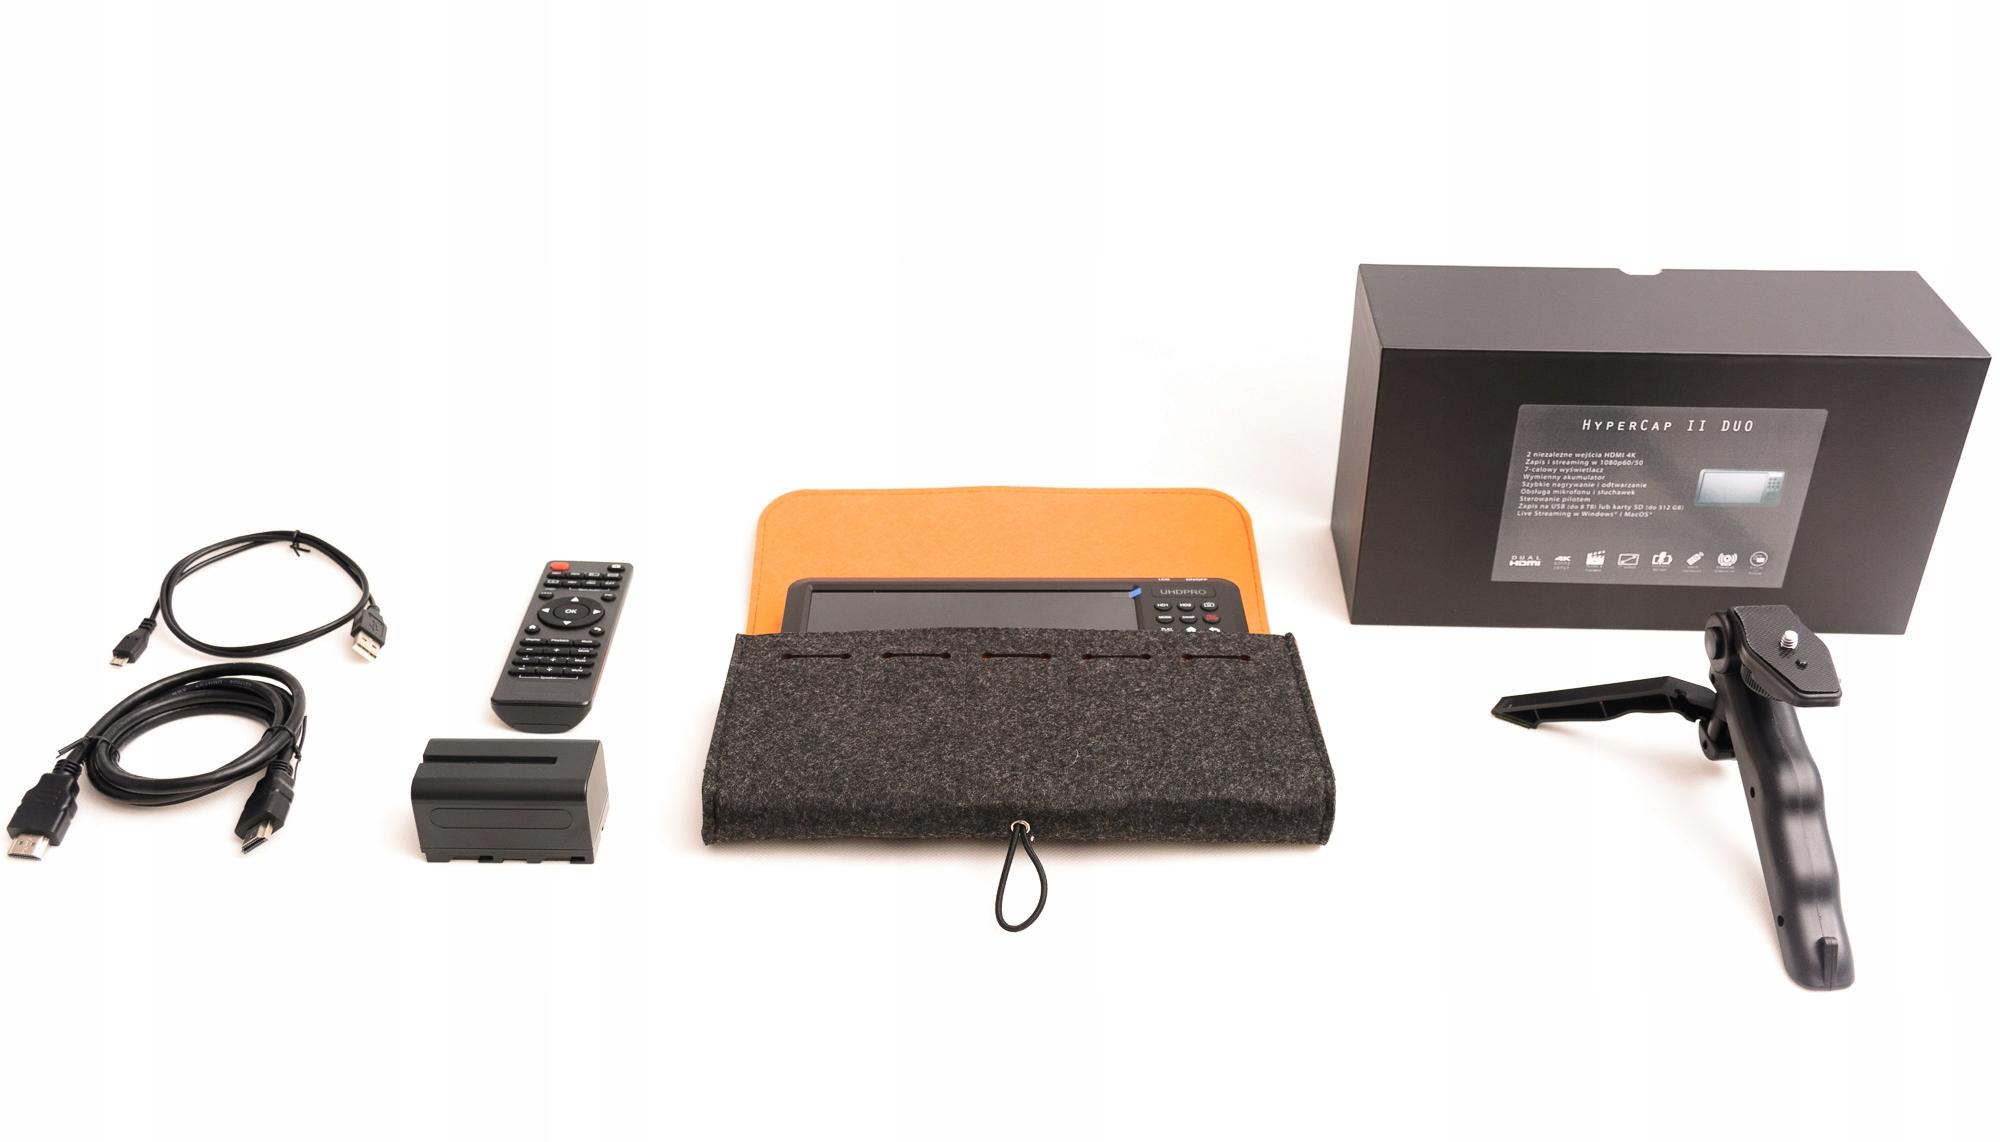 HyperCap II Duo - 2xHDMI przenośna nagrywarka Producent Velocap